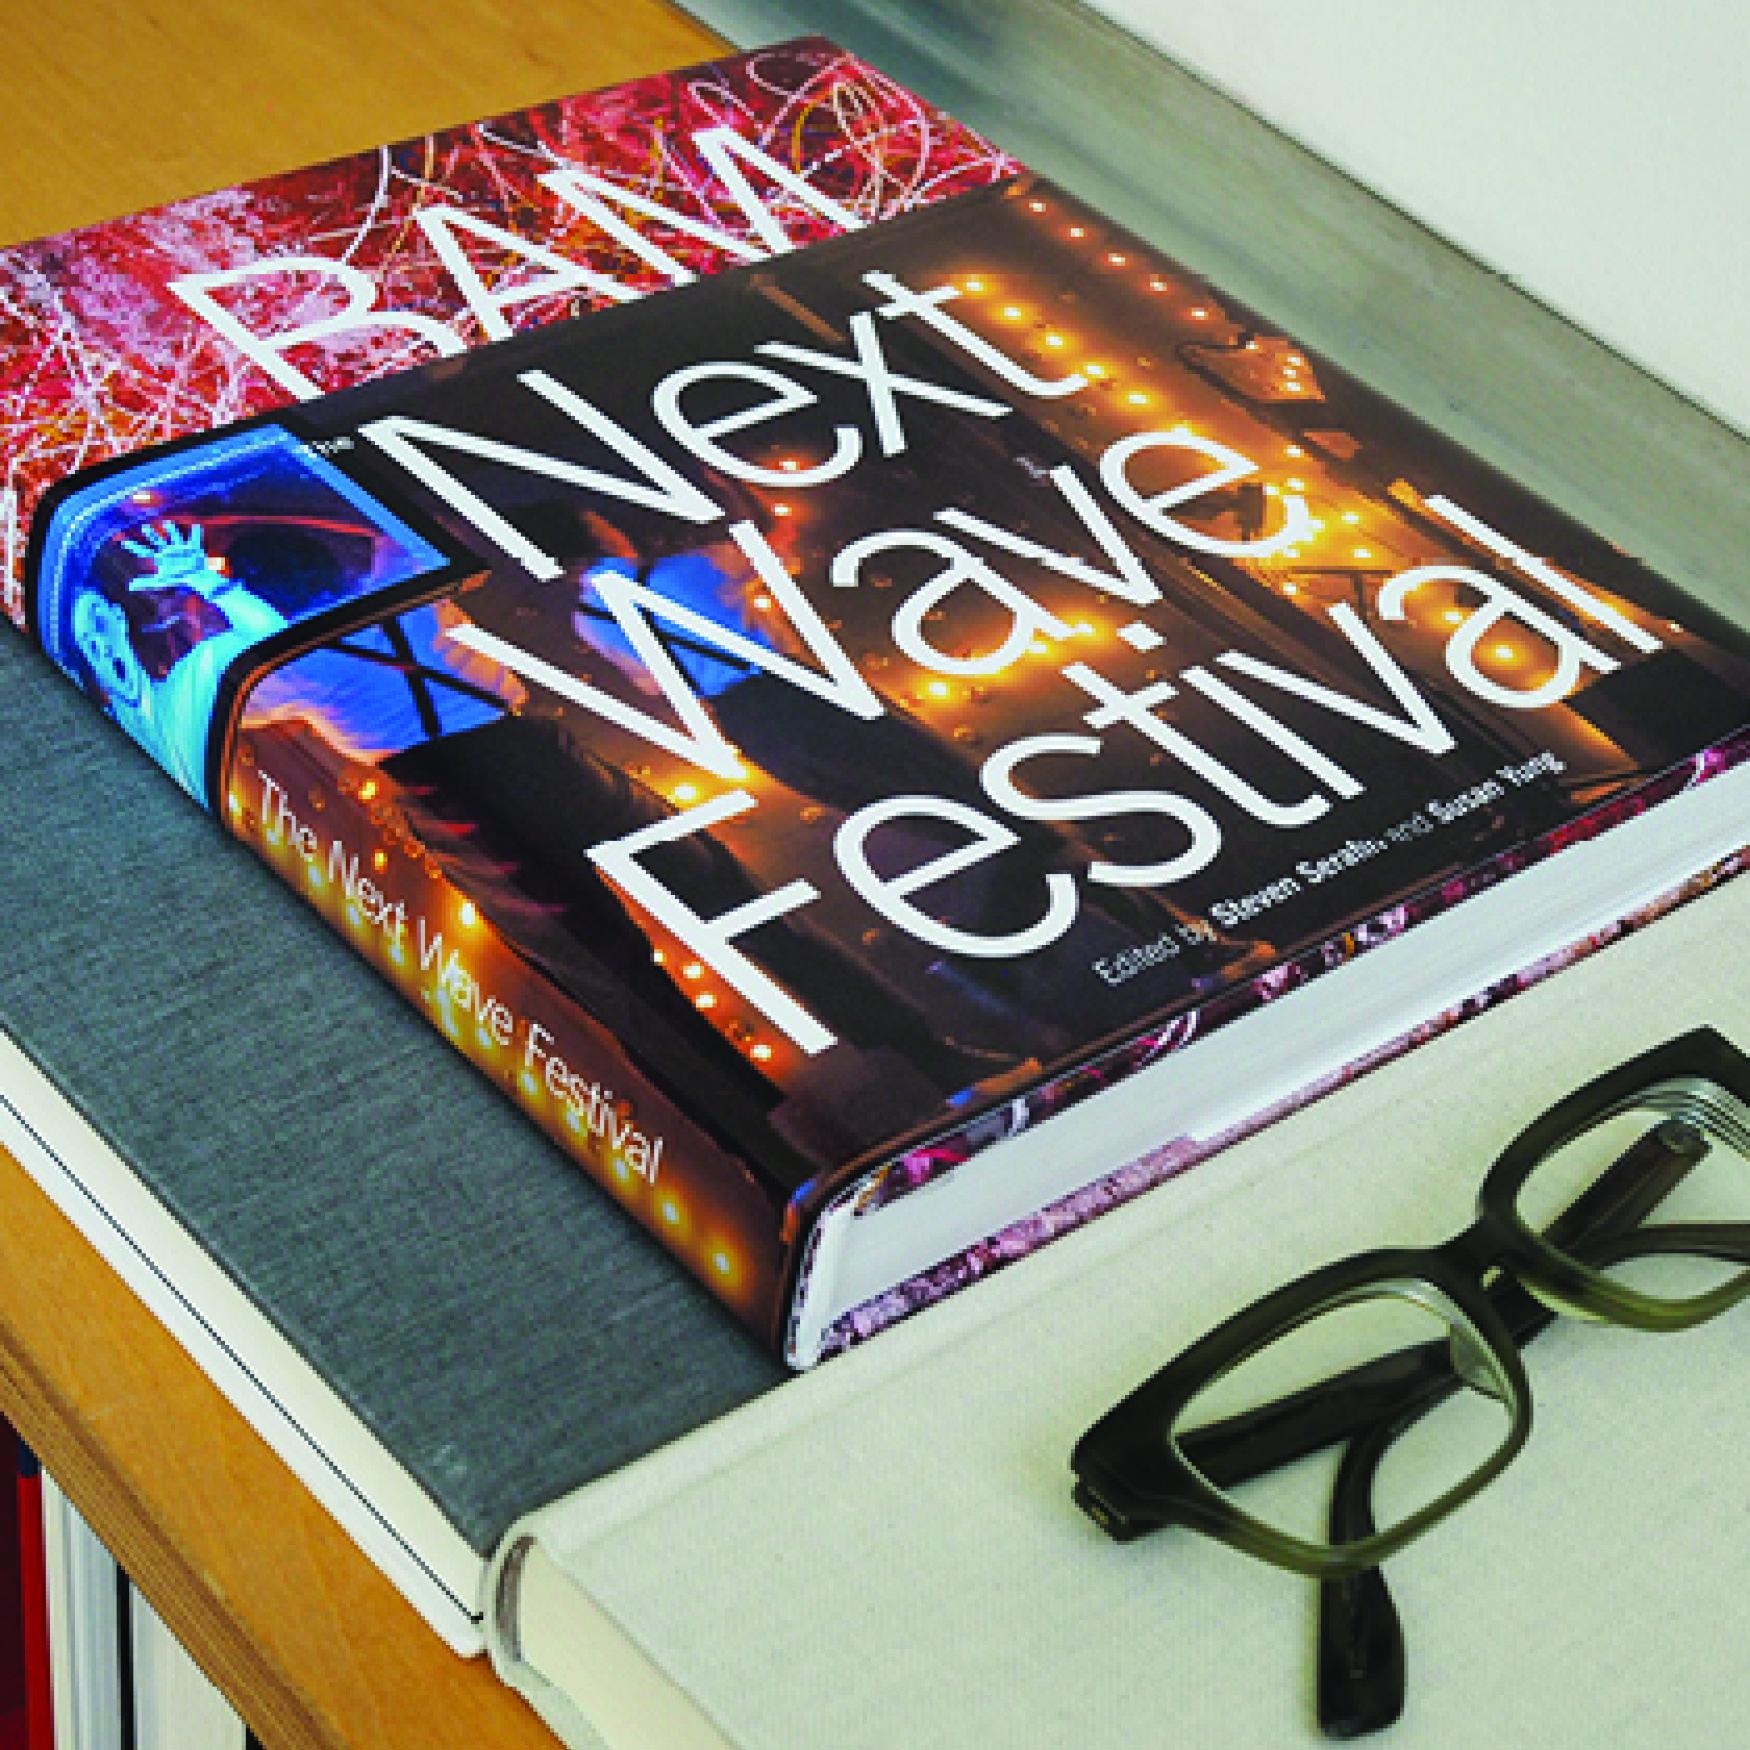 BAM: The Next Wave Festival book